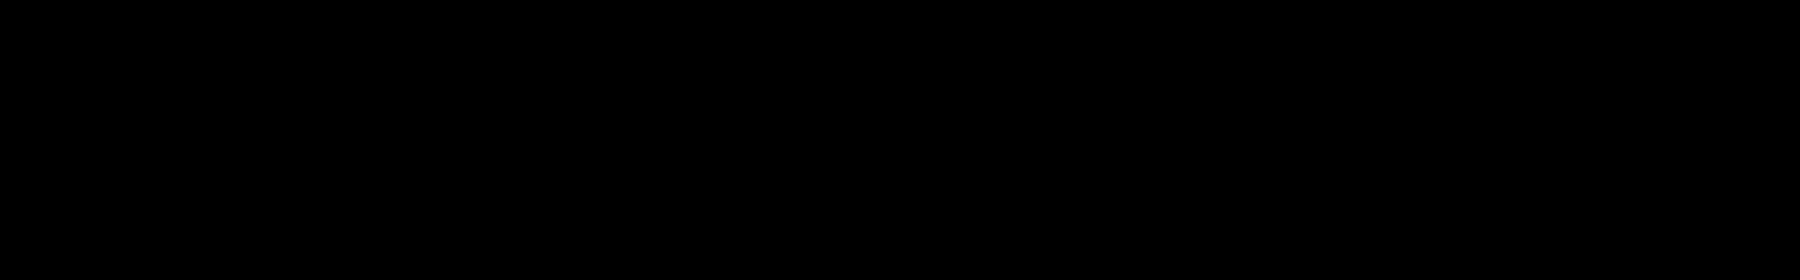 Trapsol audio waveform